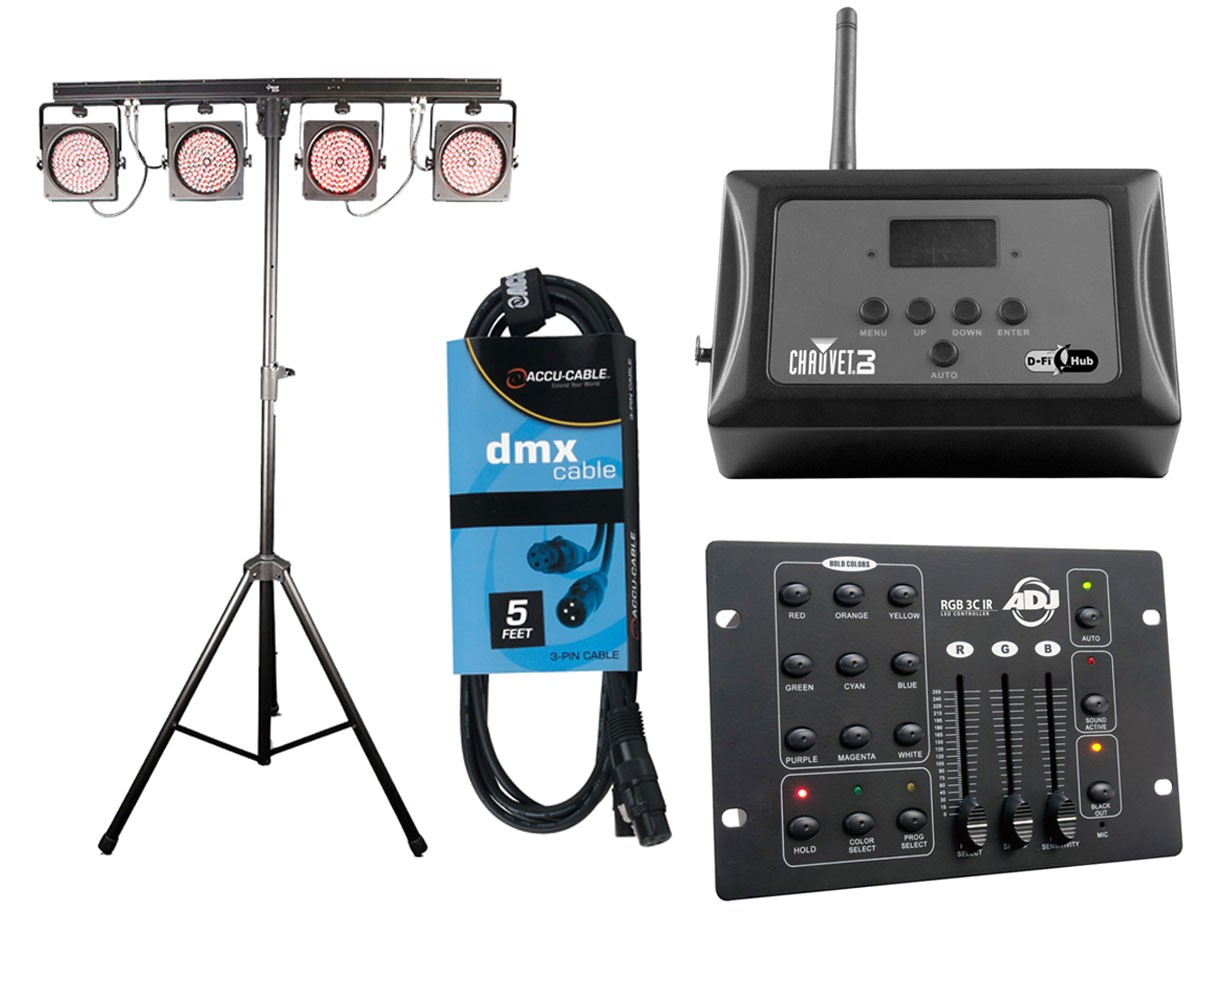 CHAUVET DJ 4BAR USB + D-Fi Hub + RGB3C IR + Cable